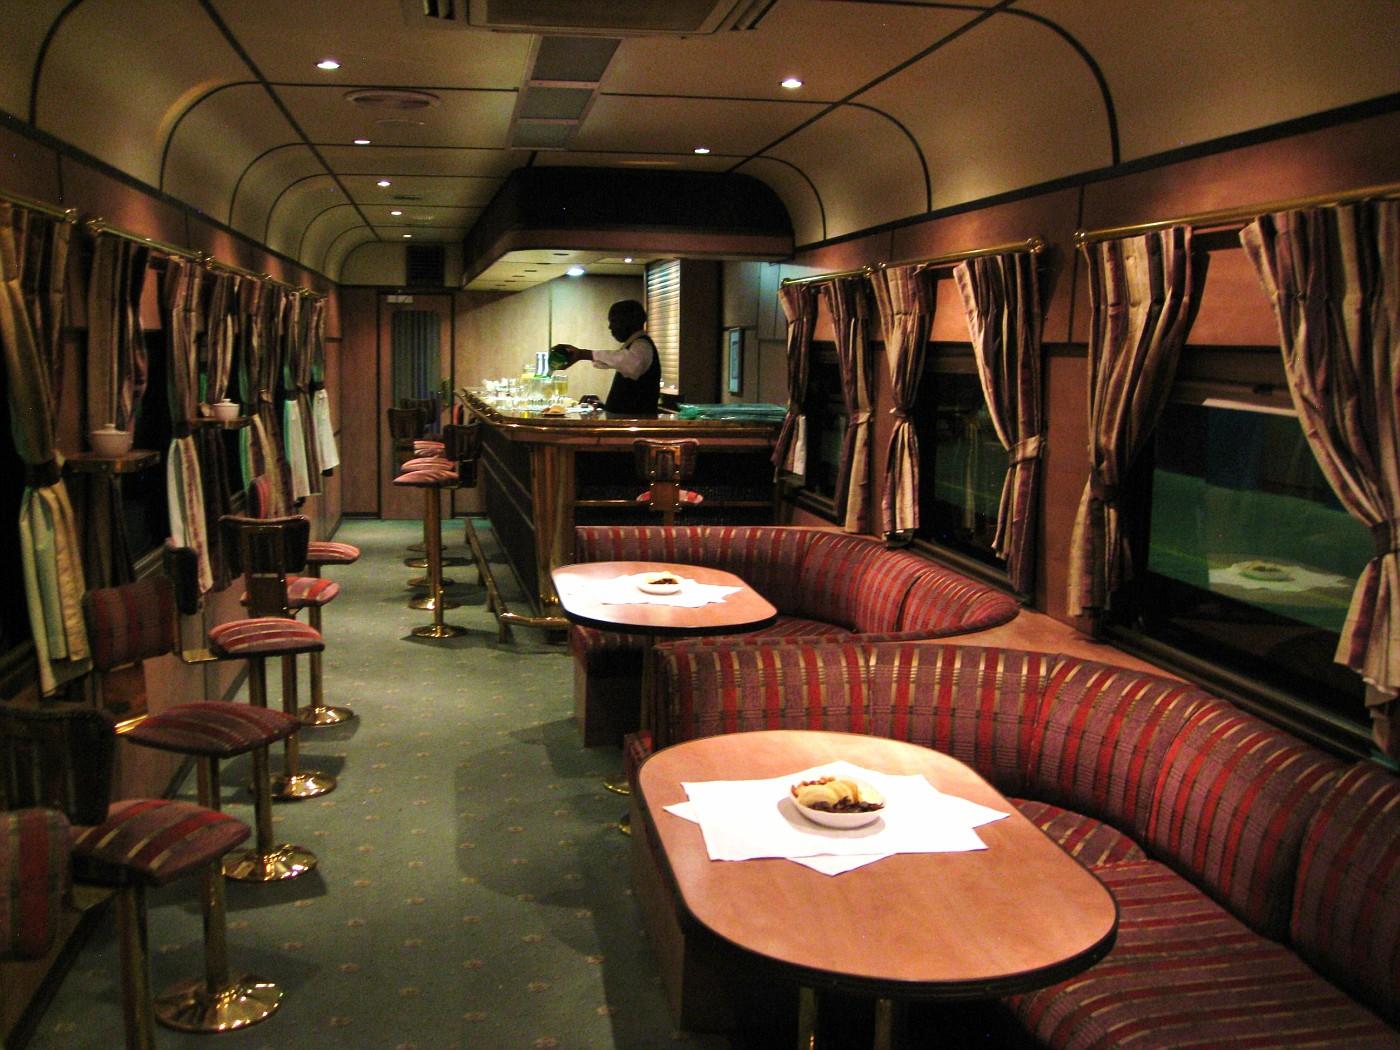 train car inside images galleries with a bite. Black Bedroom Furniture Sets. Home Design Ideas